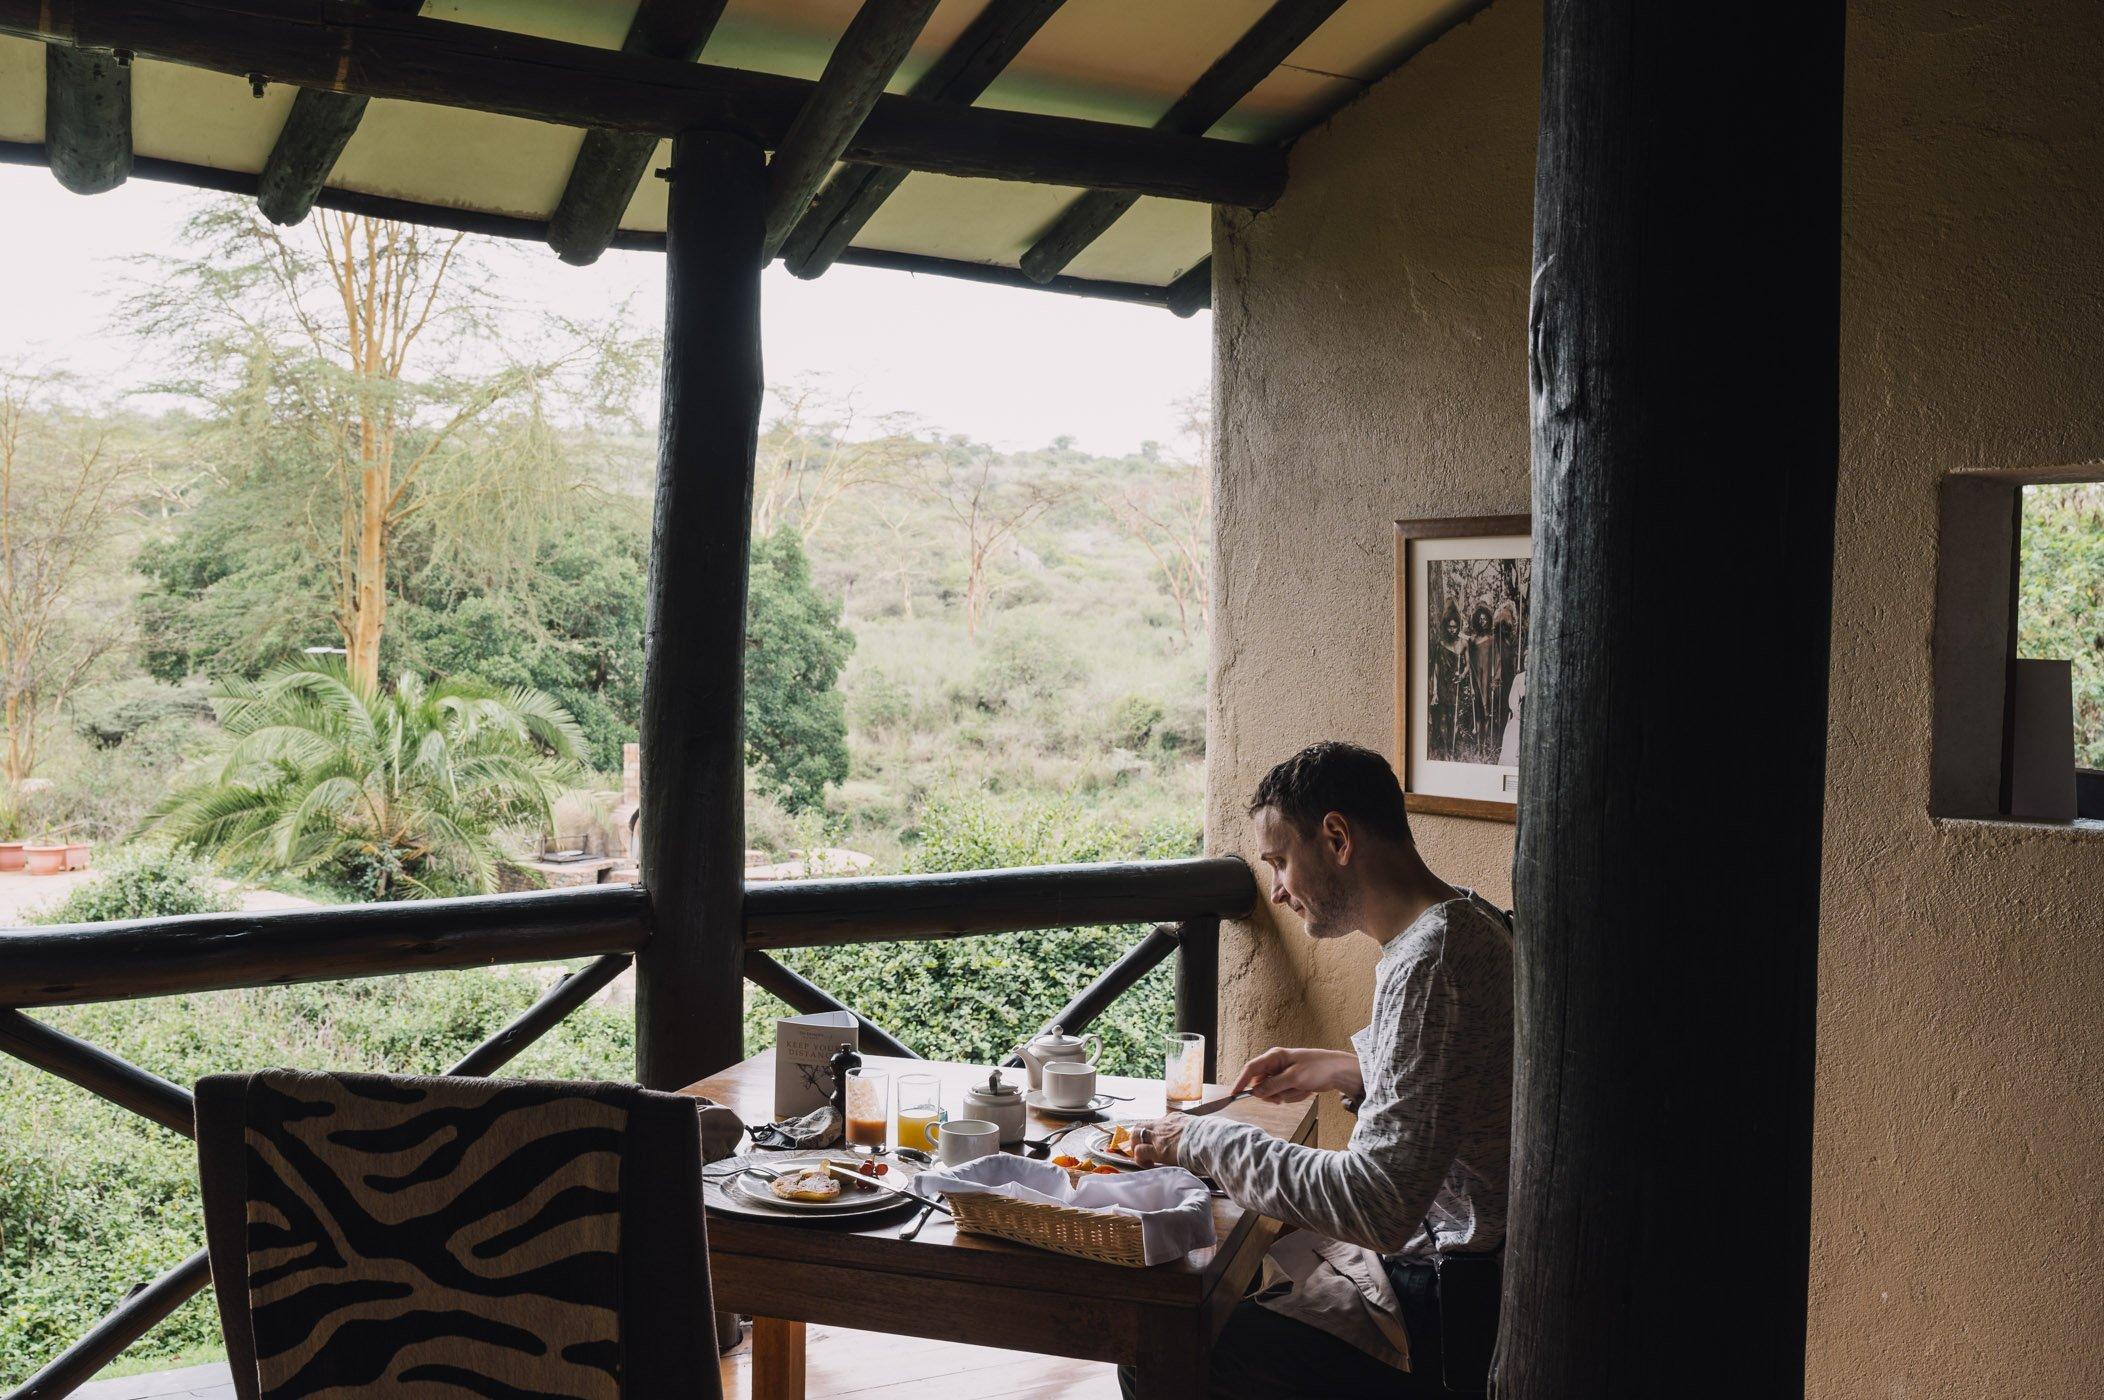 Breakfast at the Emakoko lodge in Nairobi Kenya